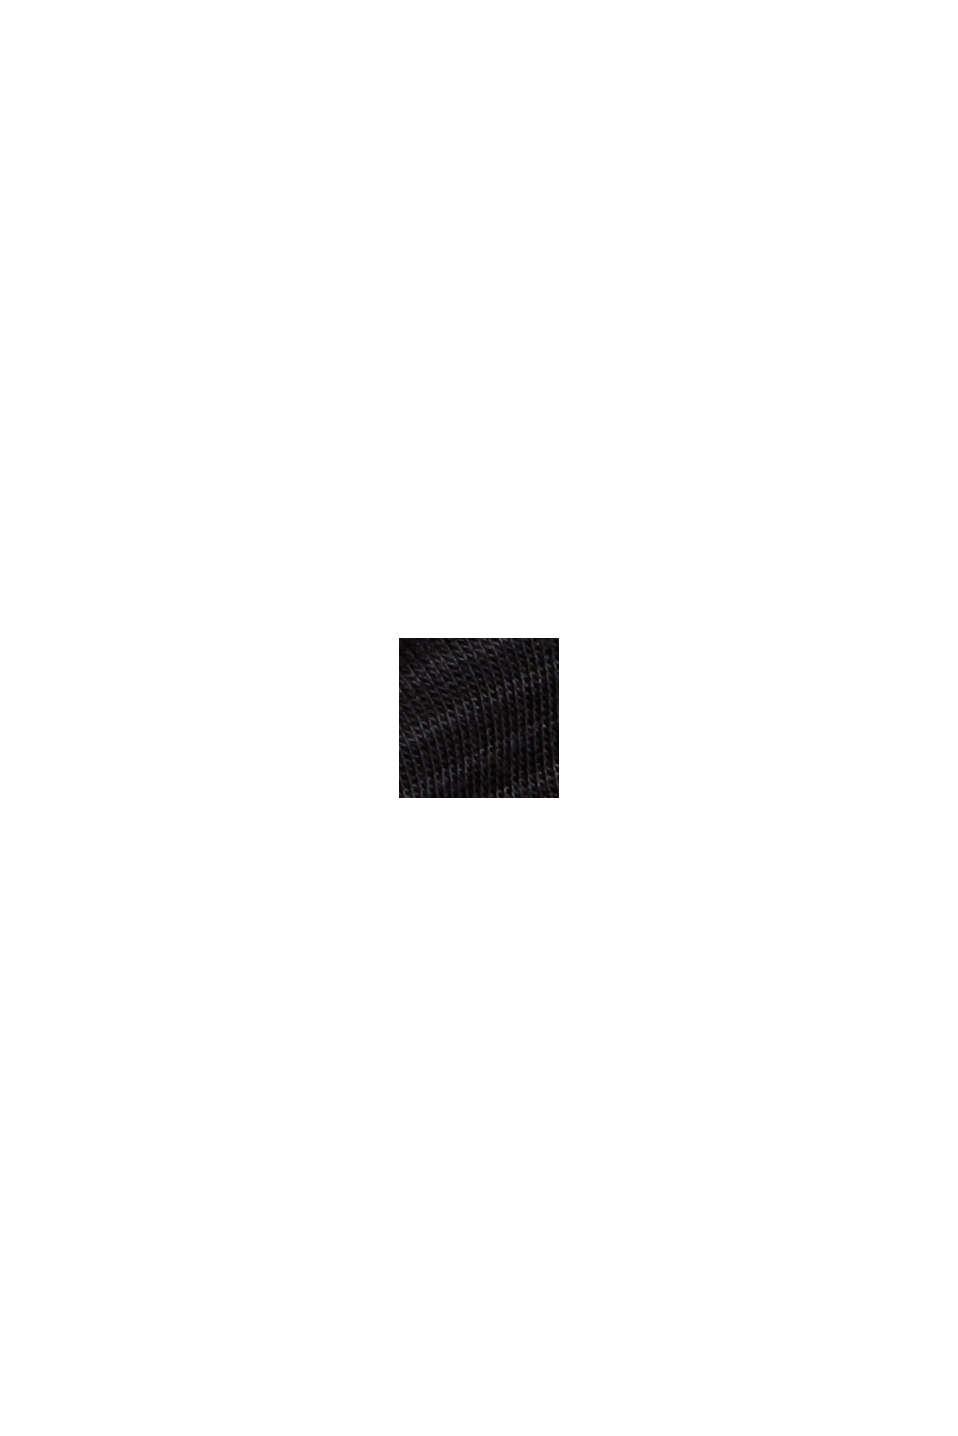 Pyjama-Shorts mit Spitze, LENZING™ ECOVERO™, BLACK, swatch